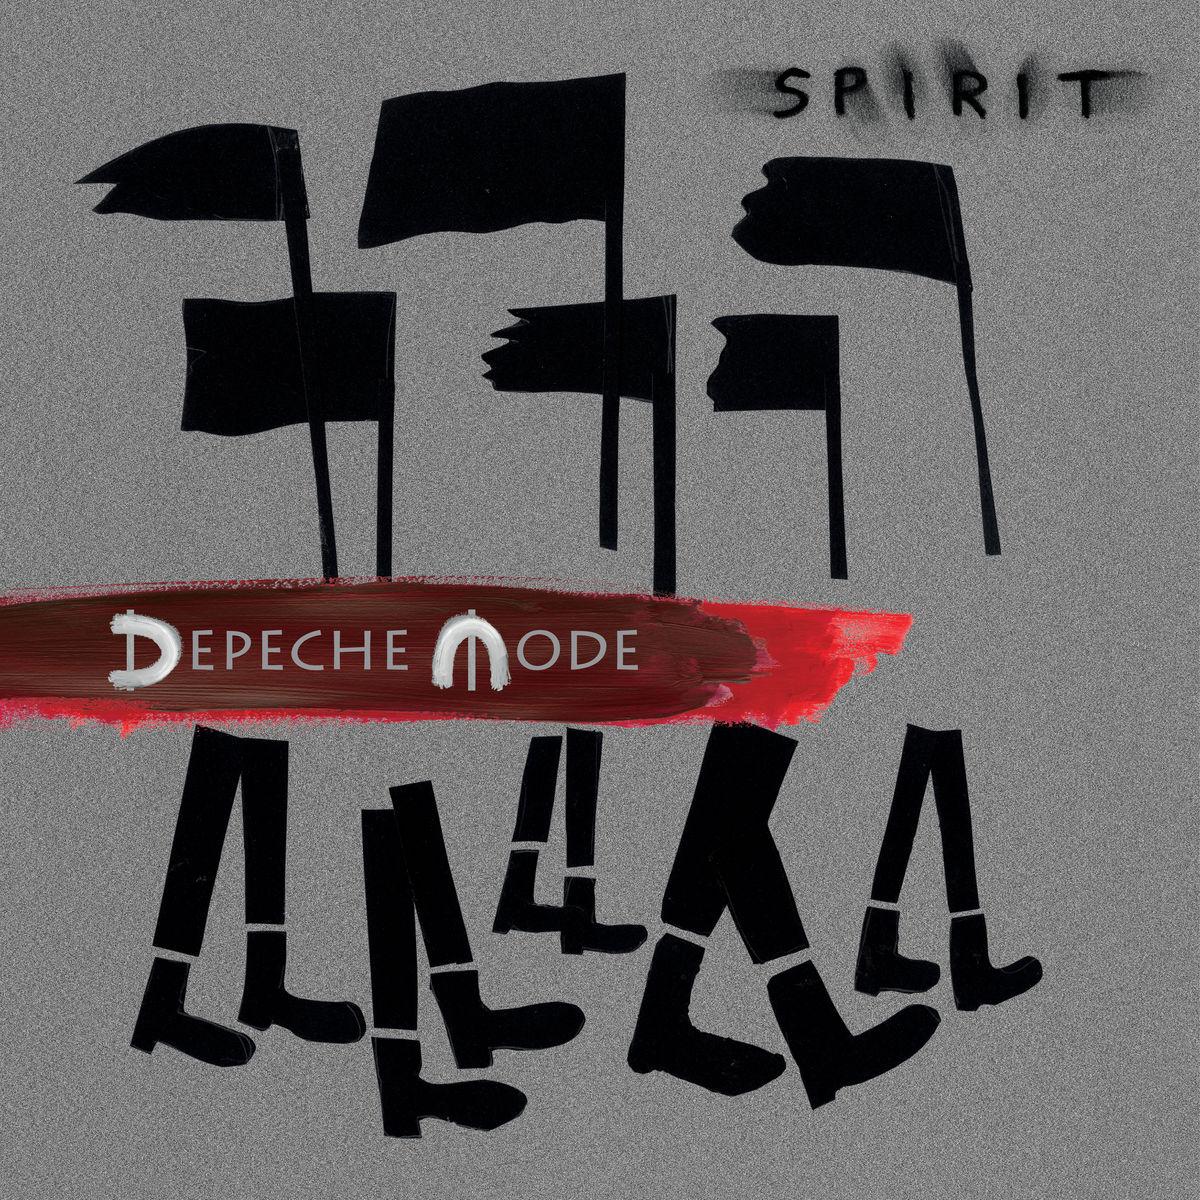 Spirit (Deluxe edition)